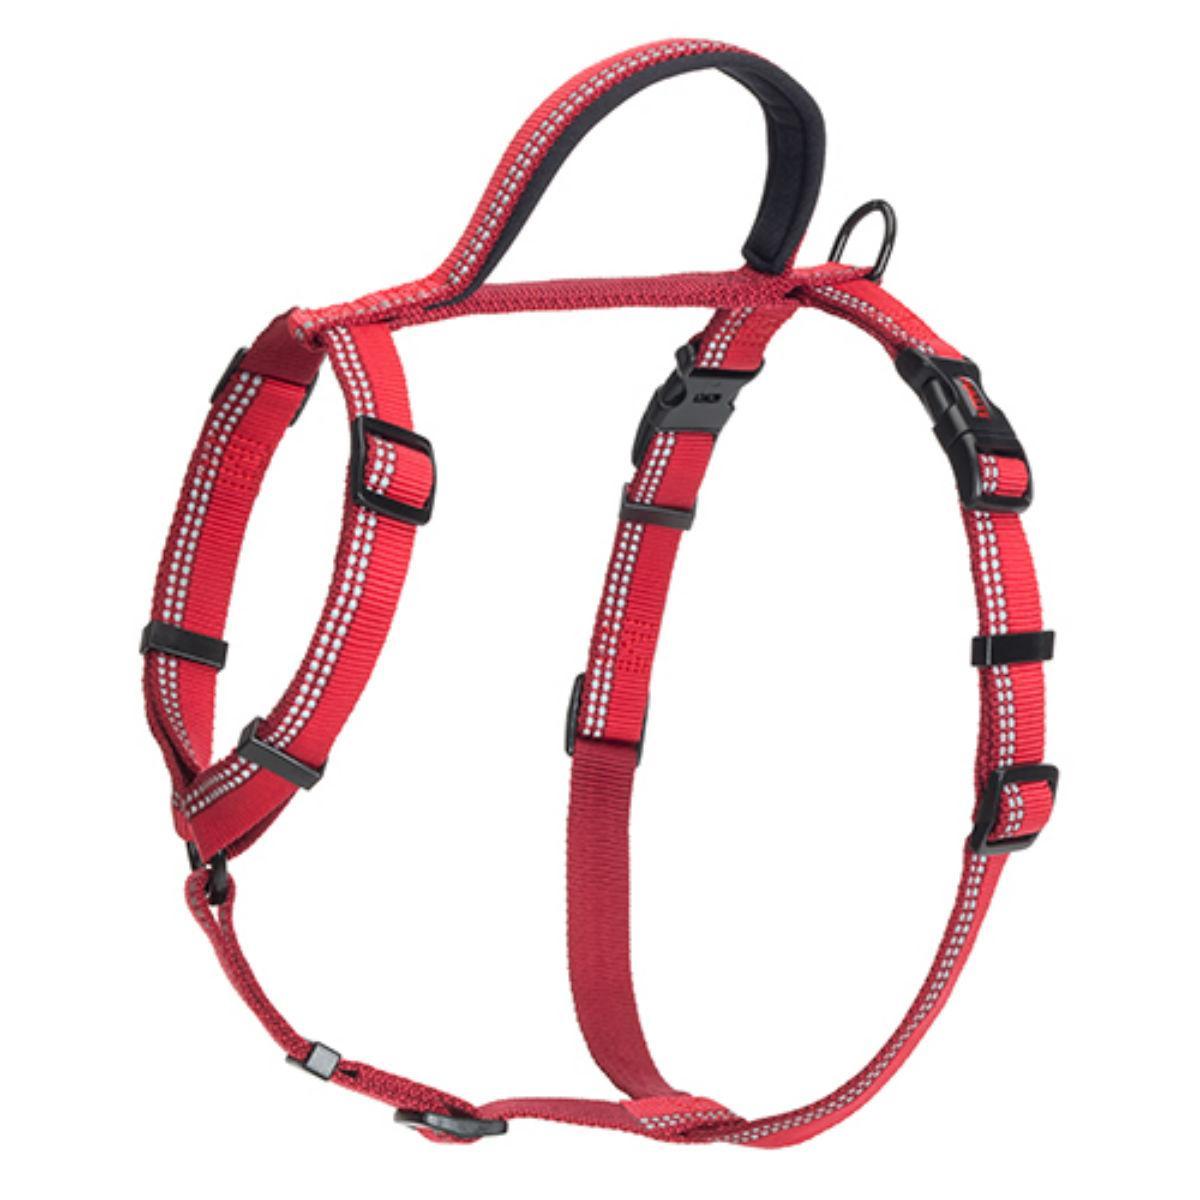 Halti Walking Dog Harness - Red